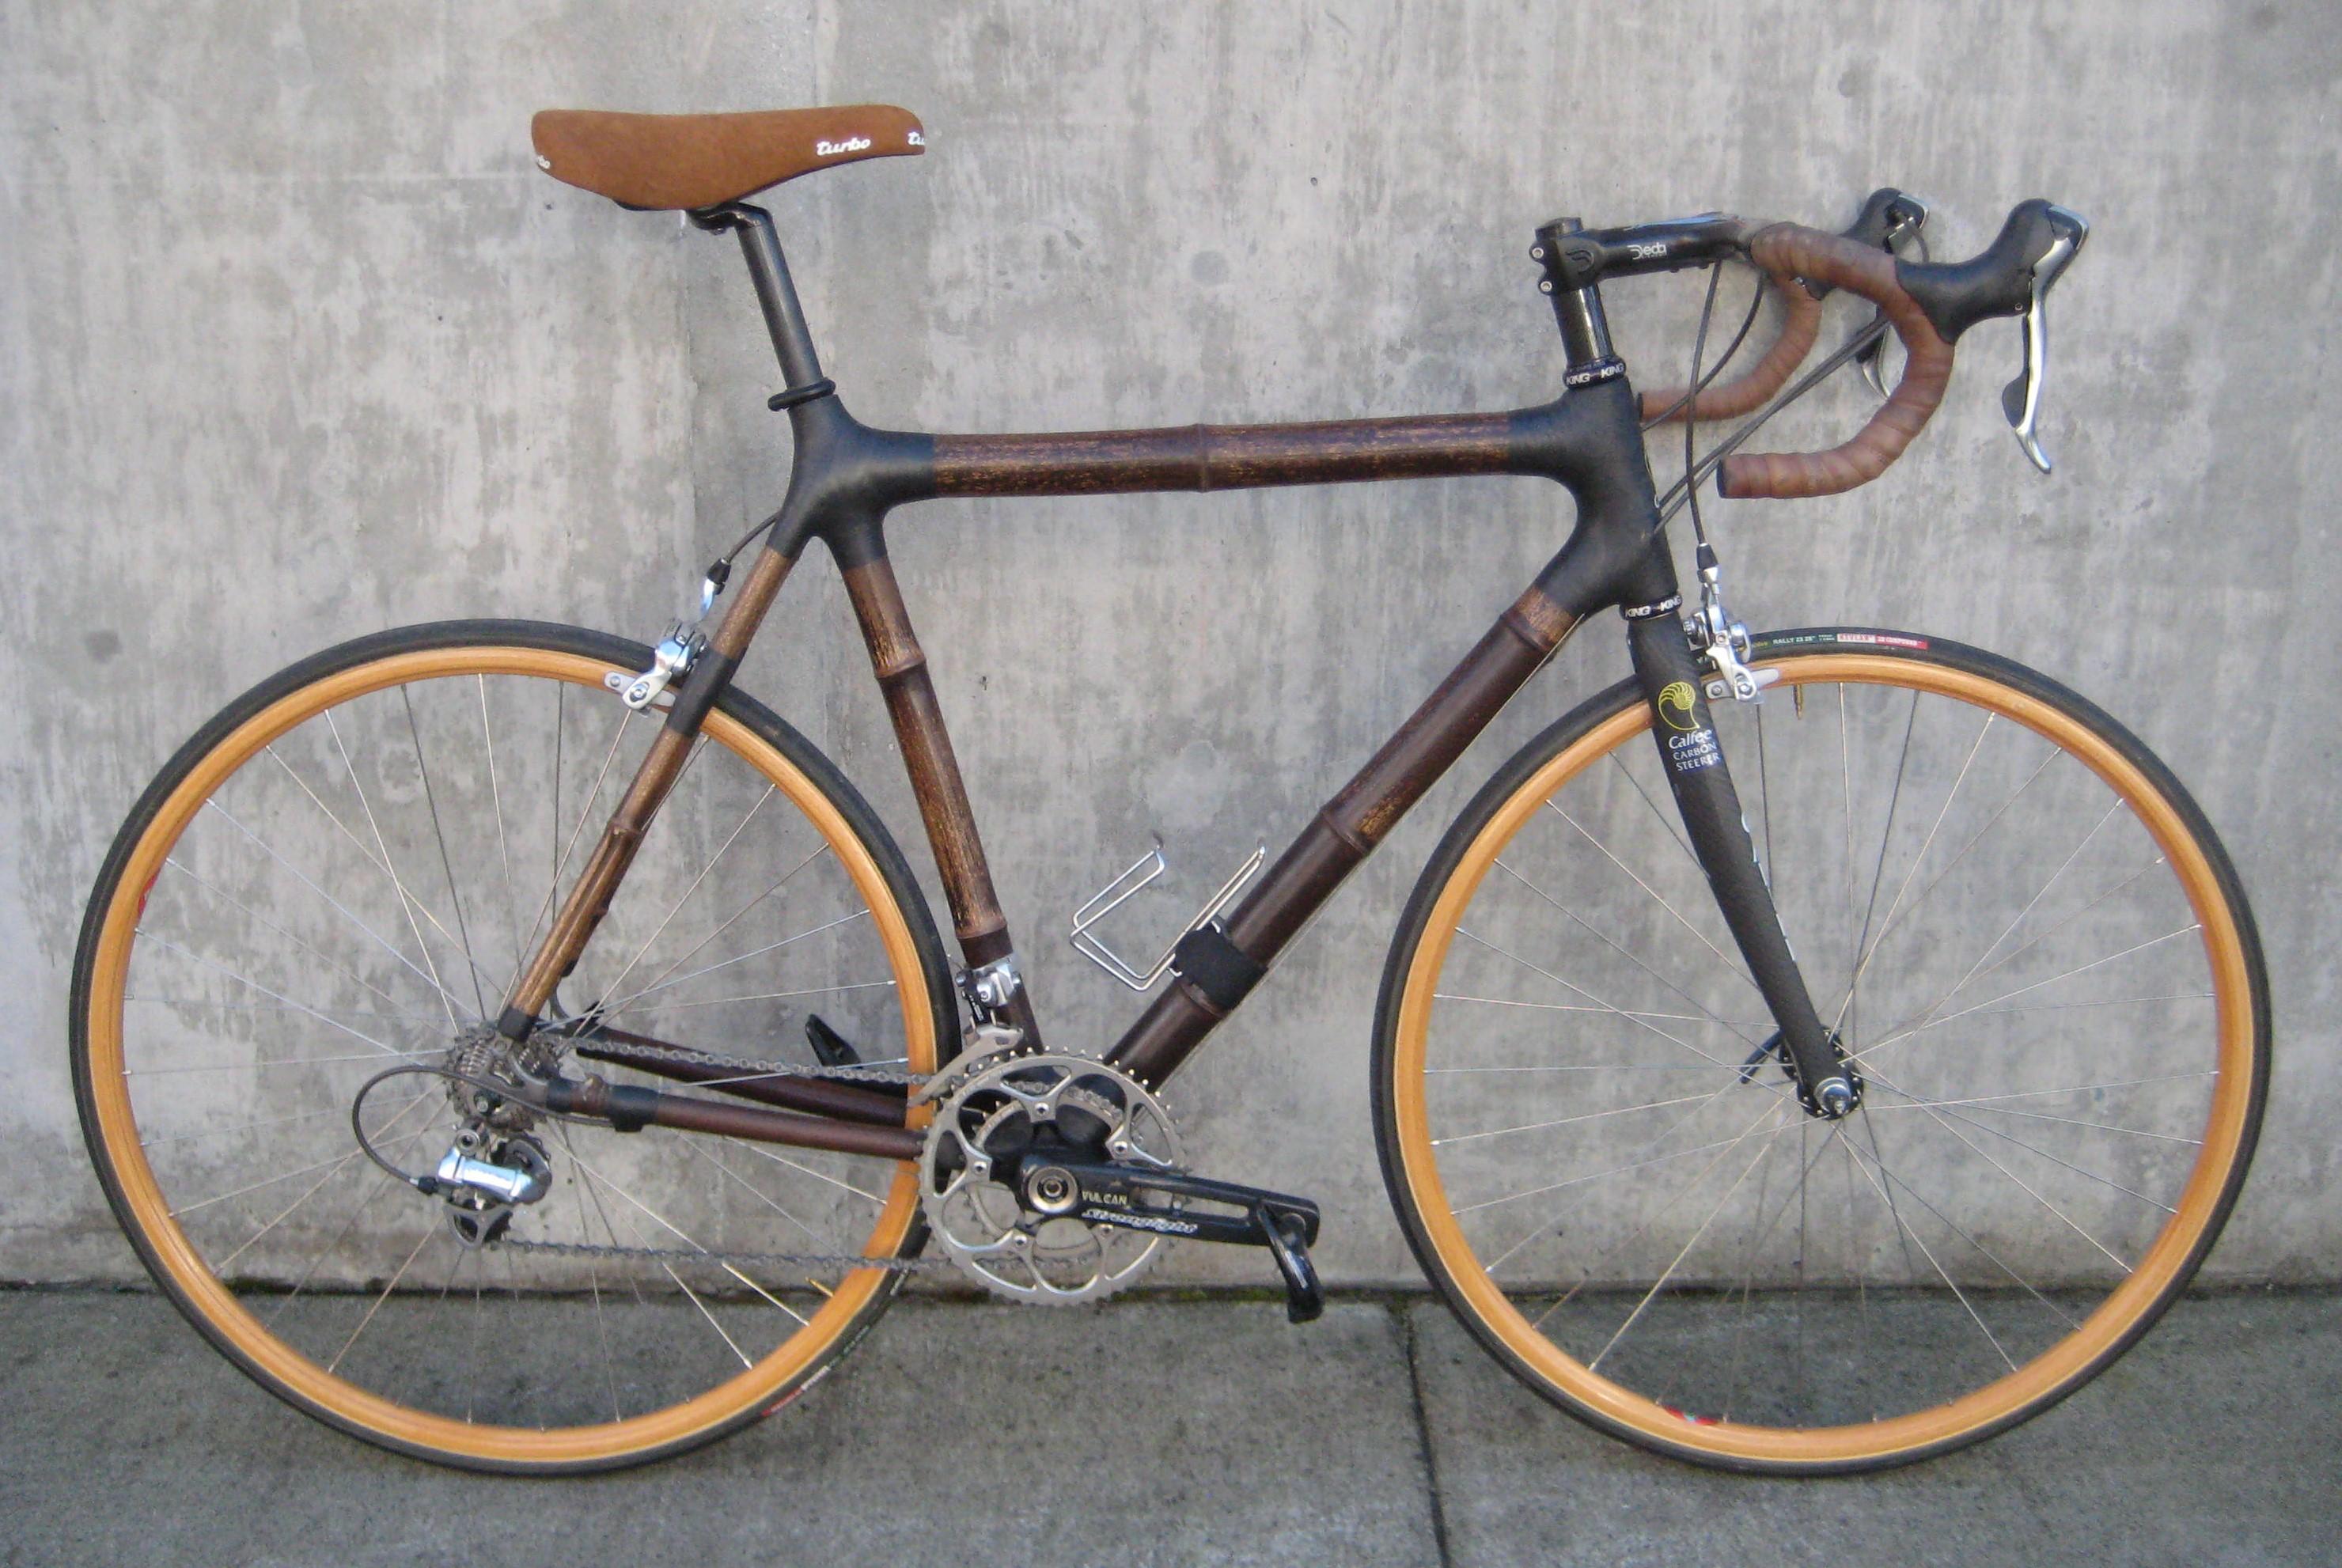 Calfee designs bamboo road bike at Classic Cycle Bainbridge Island ...